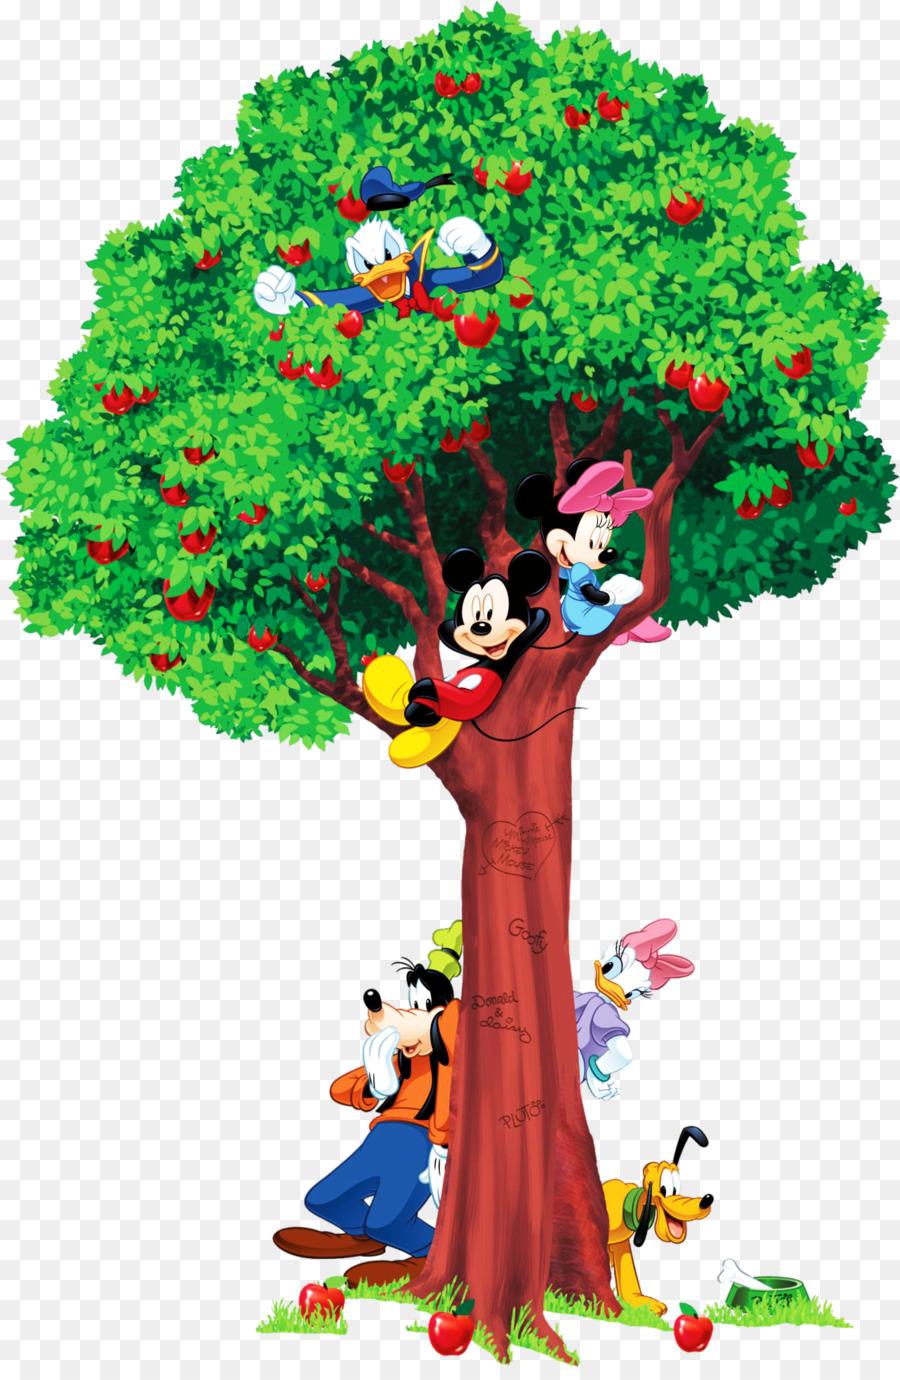 Mickey-Maus-Universum Minnie Maus Wachstum chart Wandtattoo - mickey ...